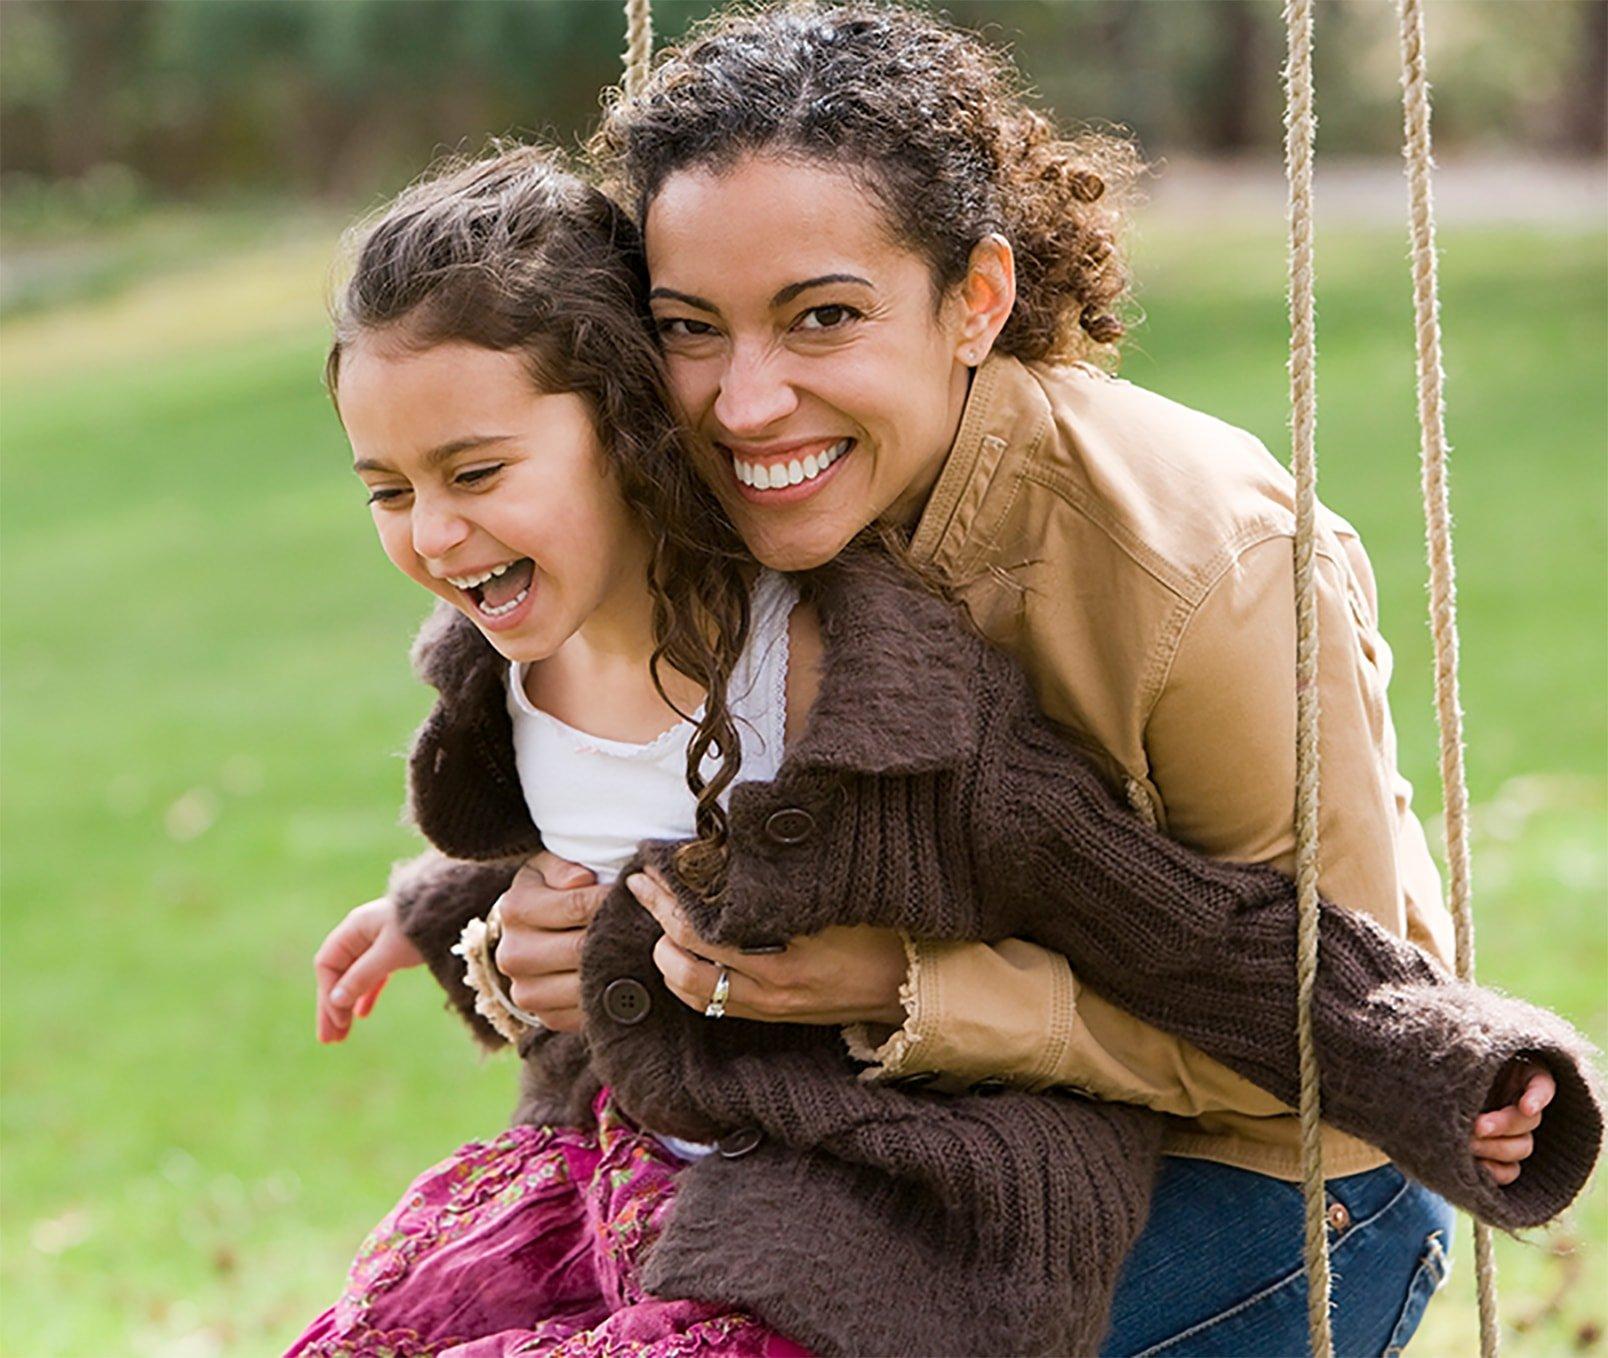 Mother swinging her daughter